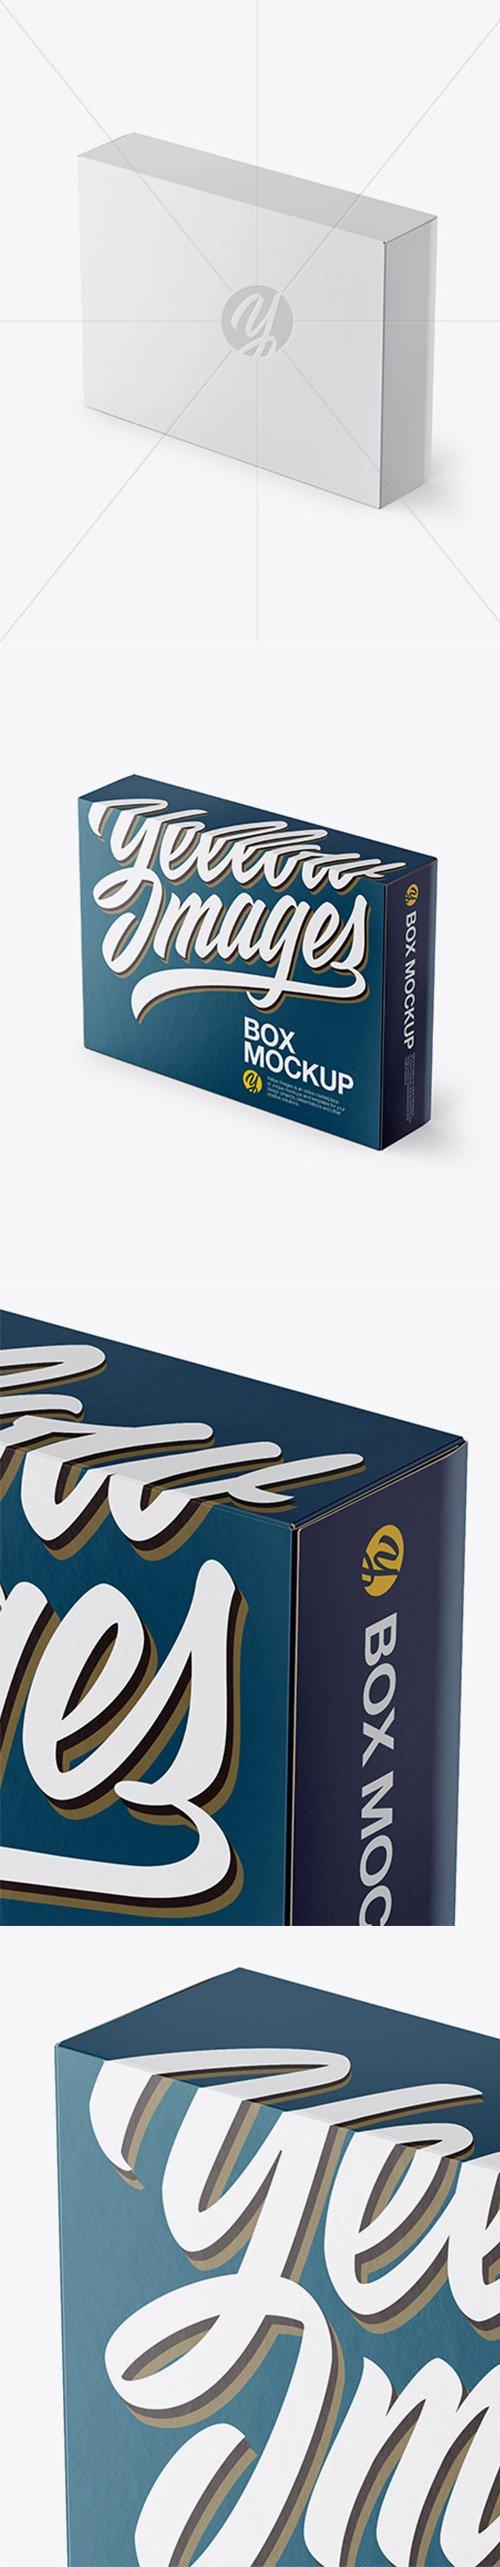 Box Mockup - Half Side View (High Angle Shot) 22357 TIF